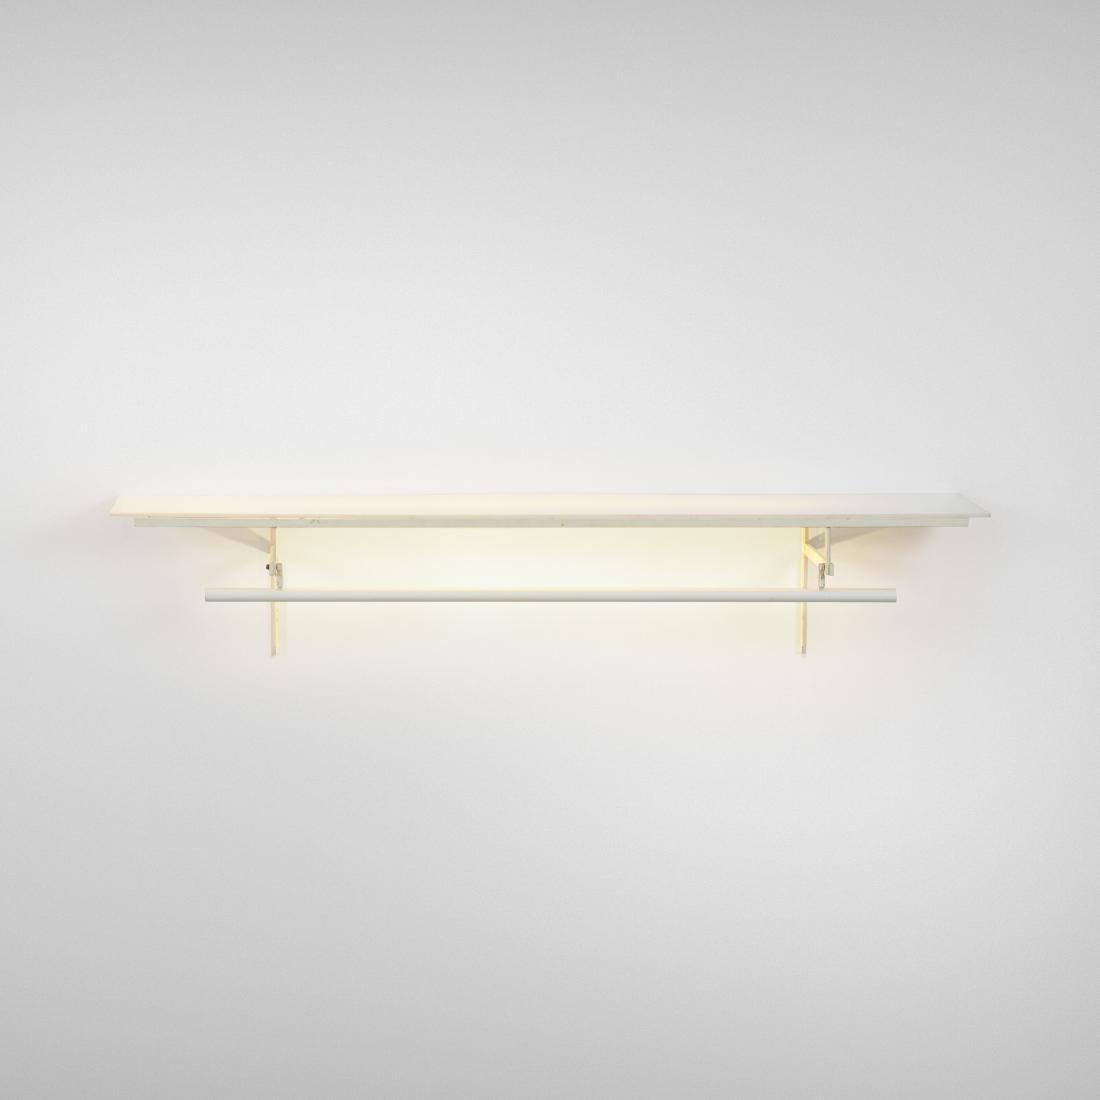 Paul Rudolph, custom illuminated shelf, 23 Beekman Pl.